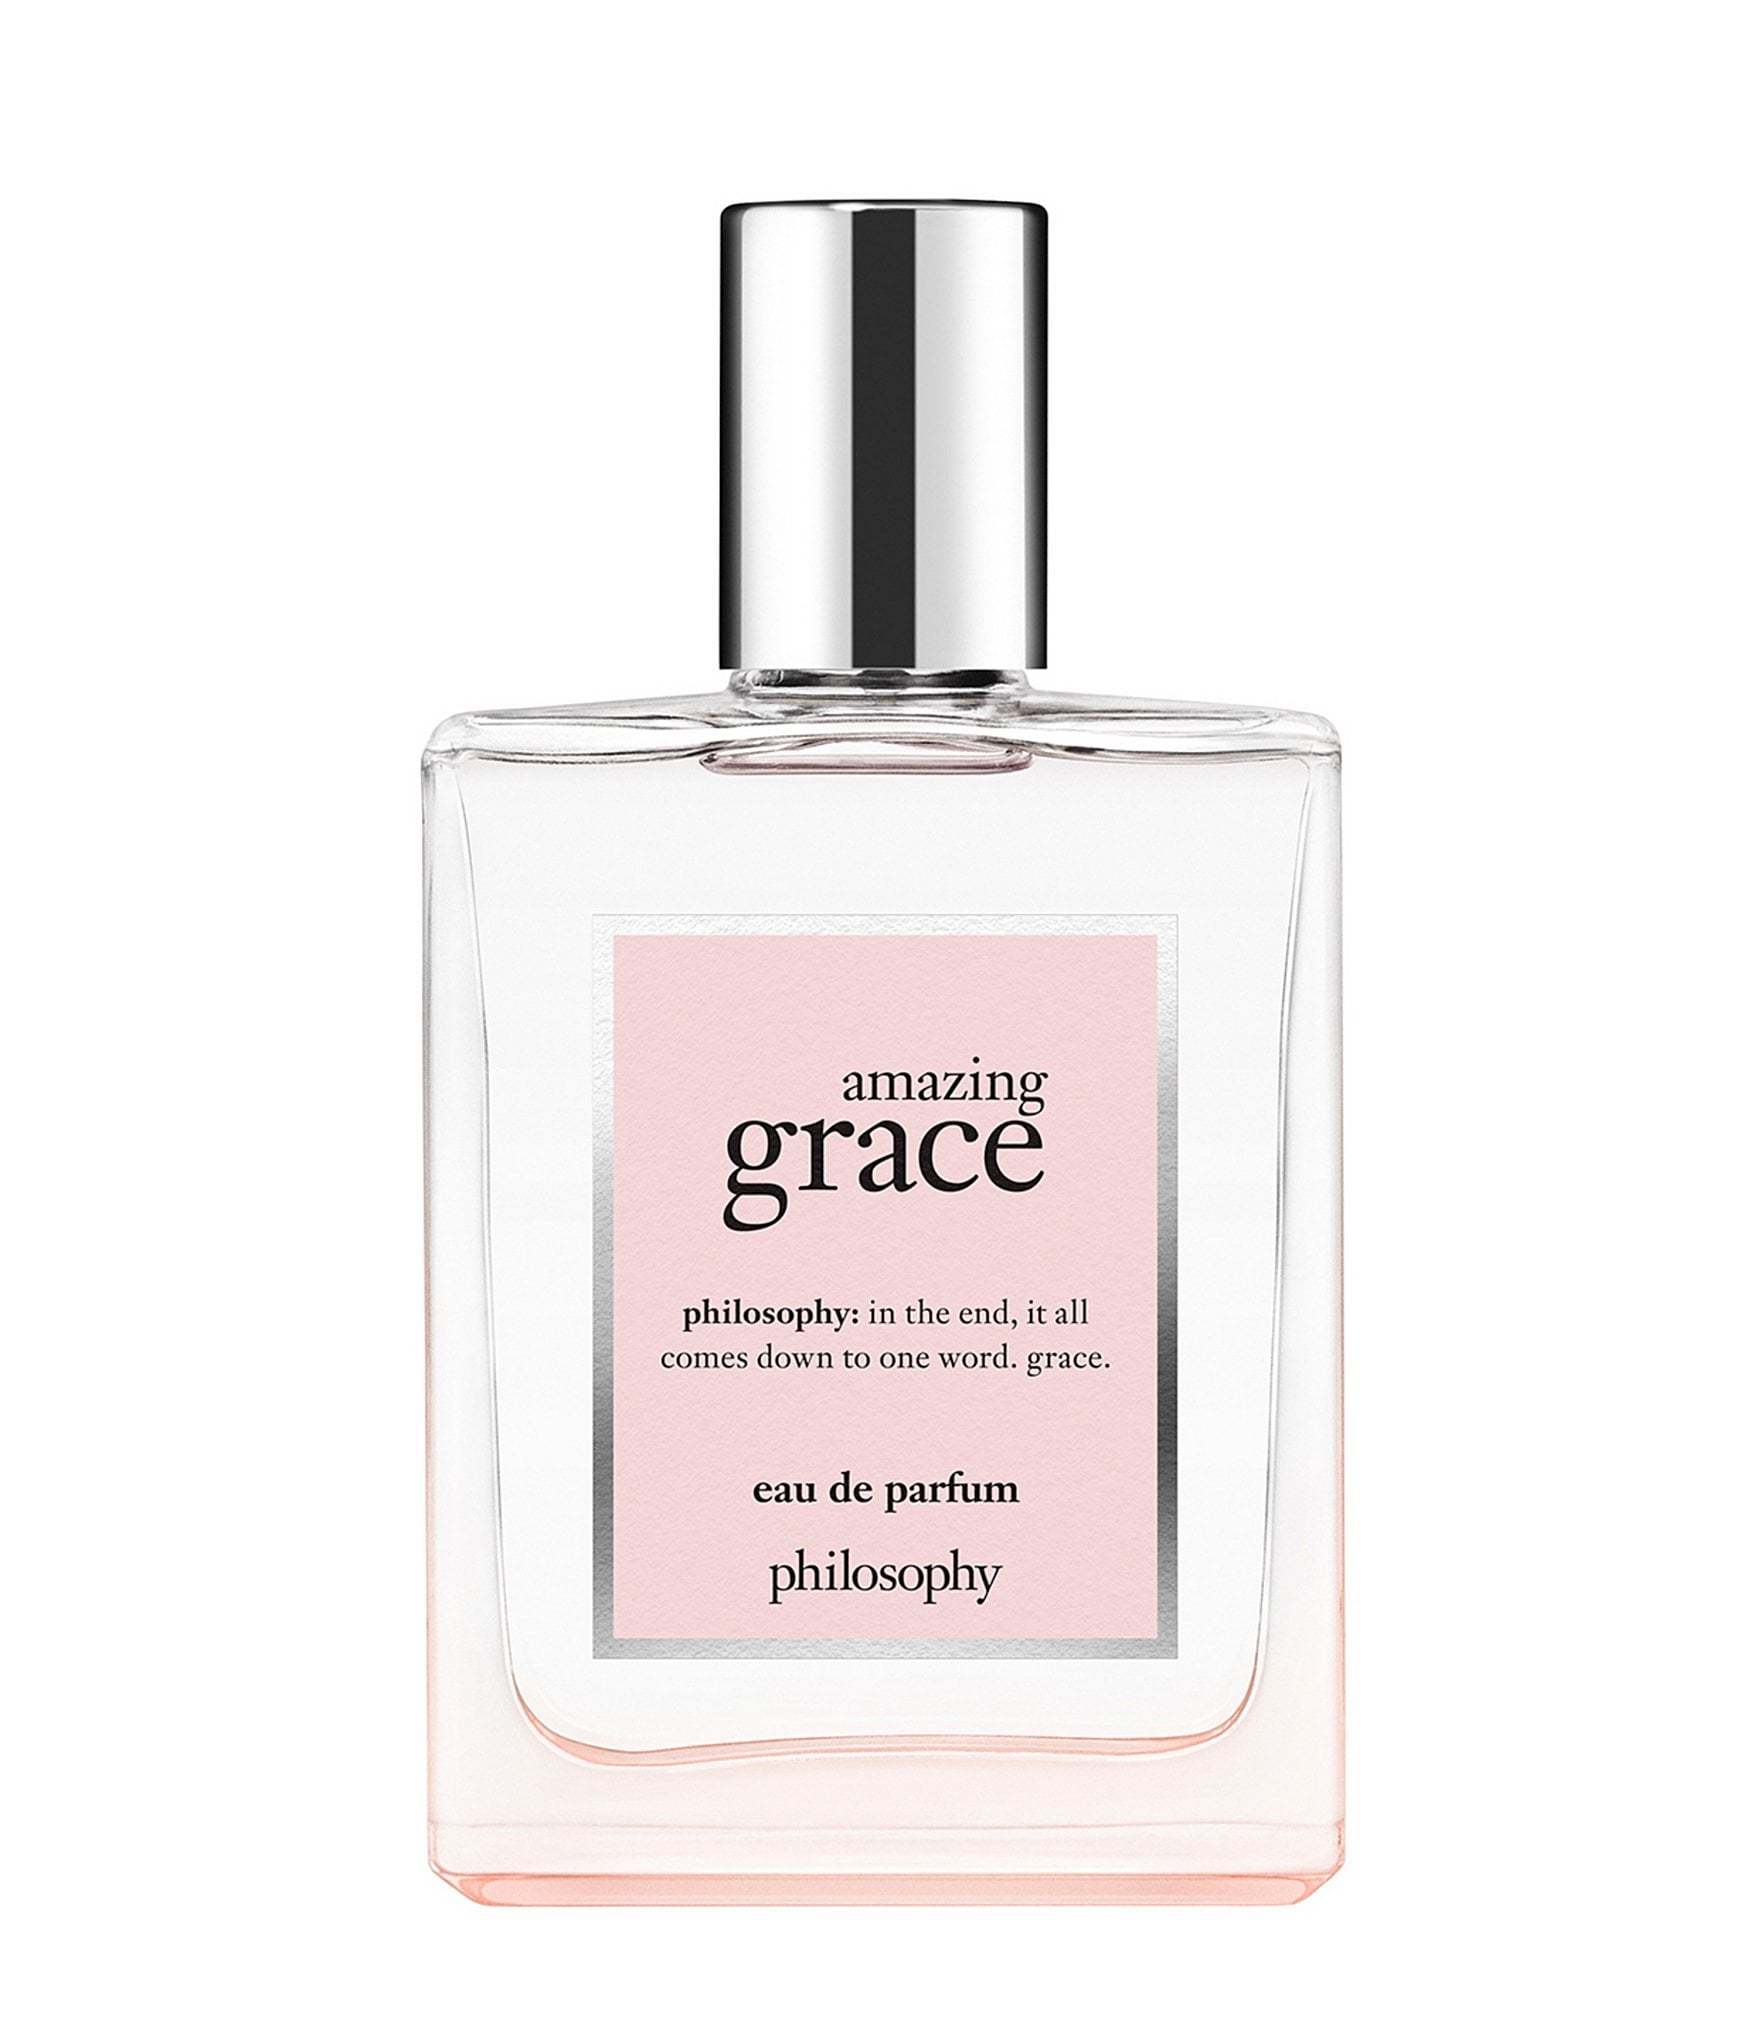 Philosophy Amazing Grace Eau De Parfum Spray Dillards